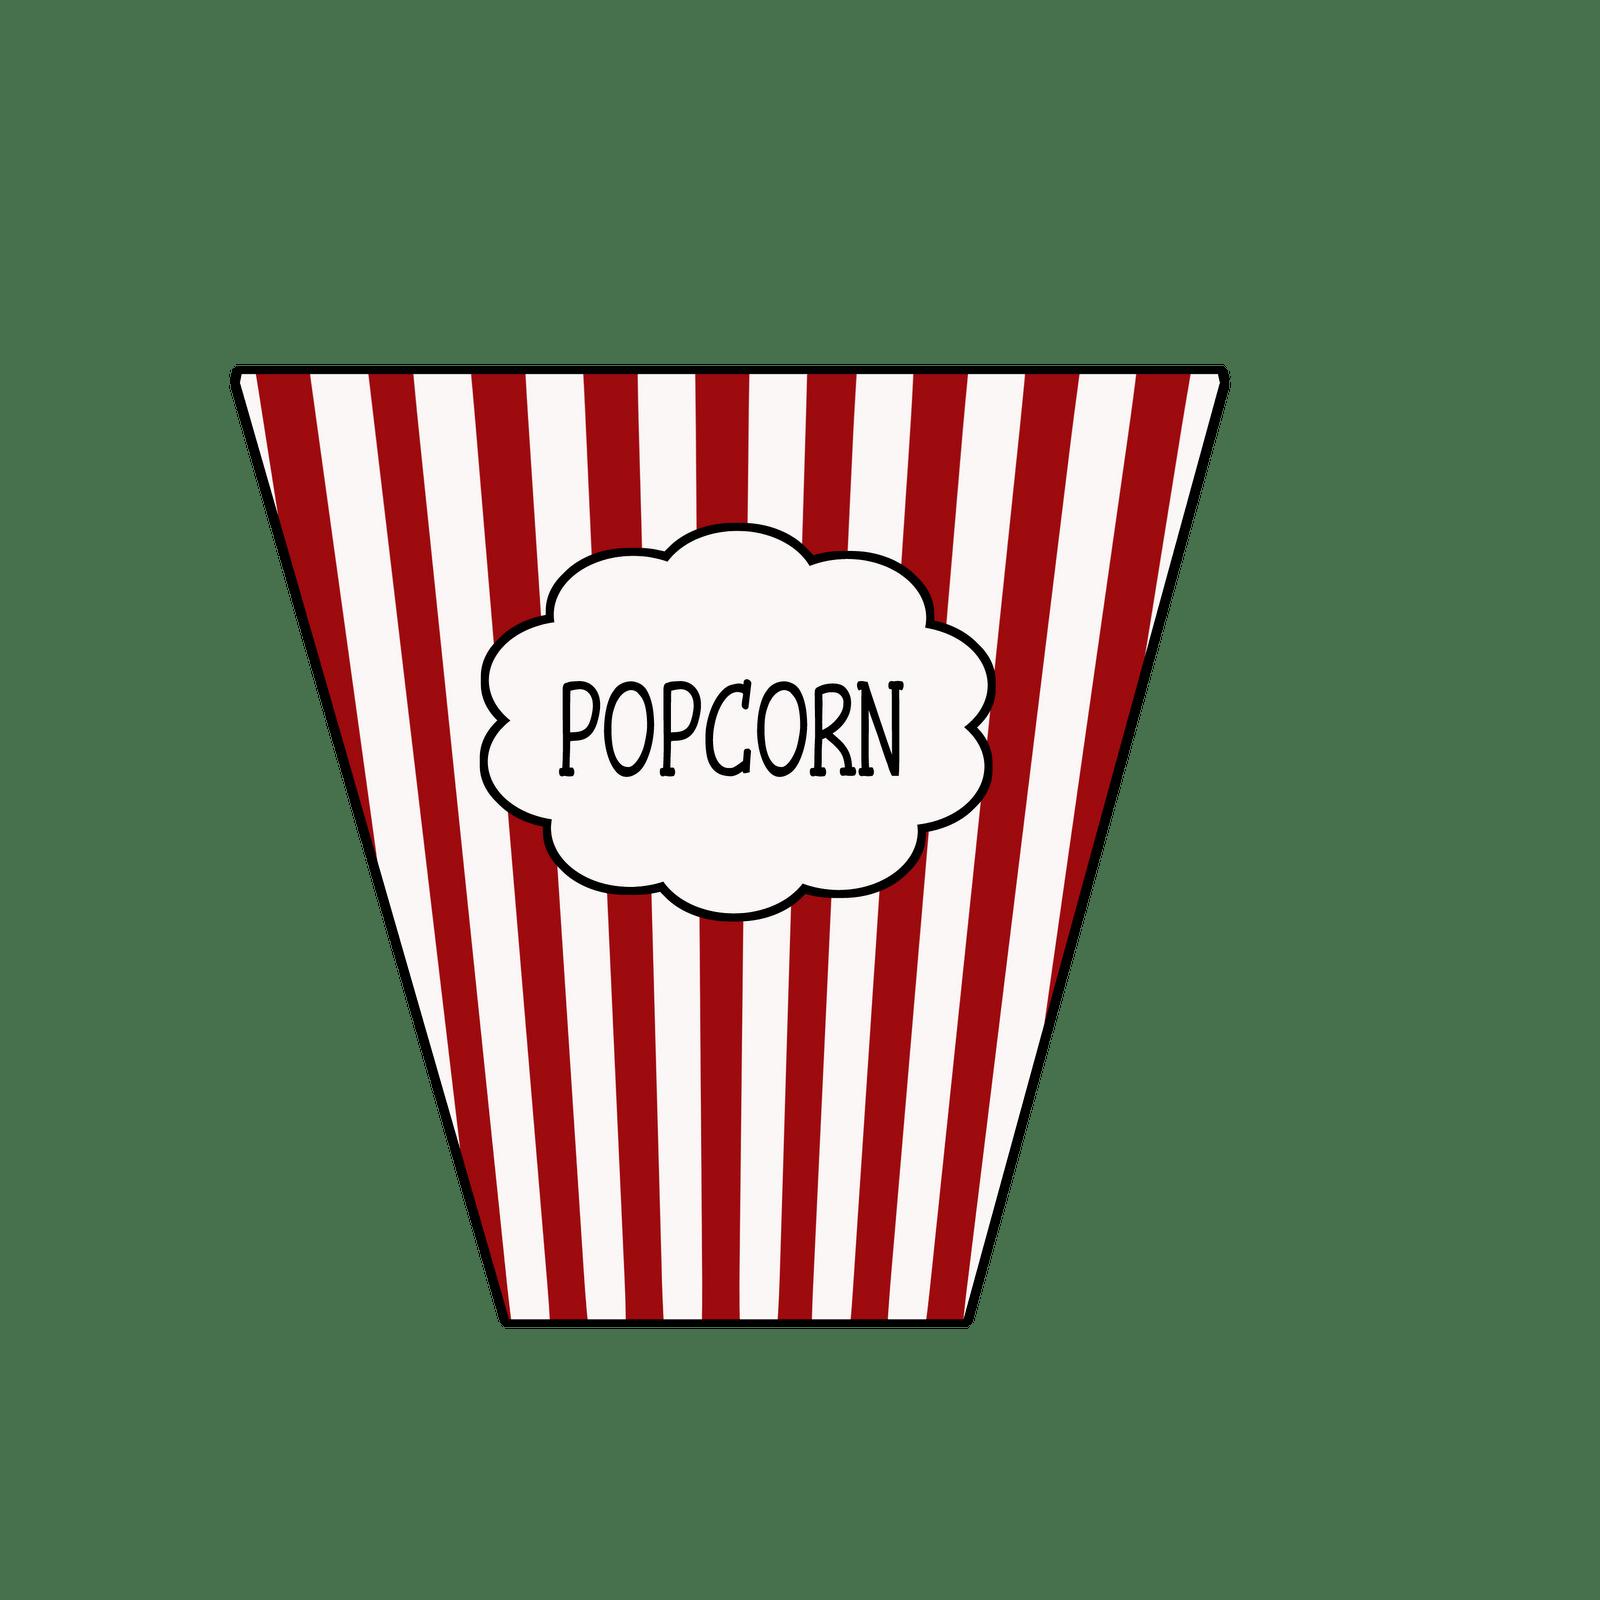 Popcorn Clip Art Black And White Outline